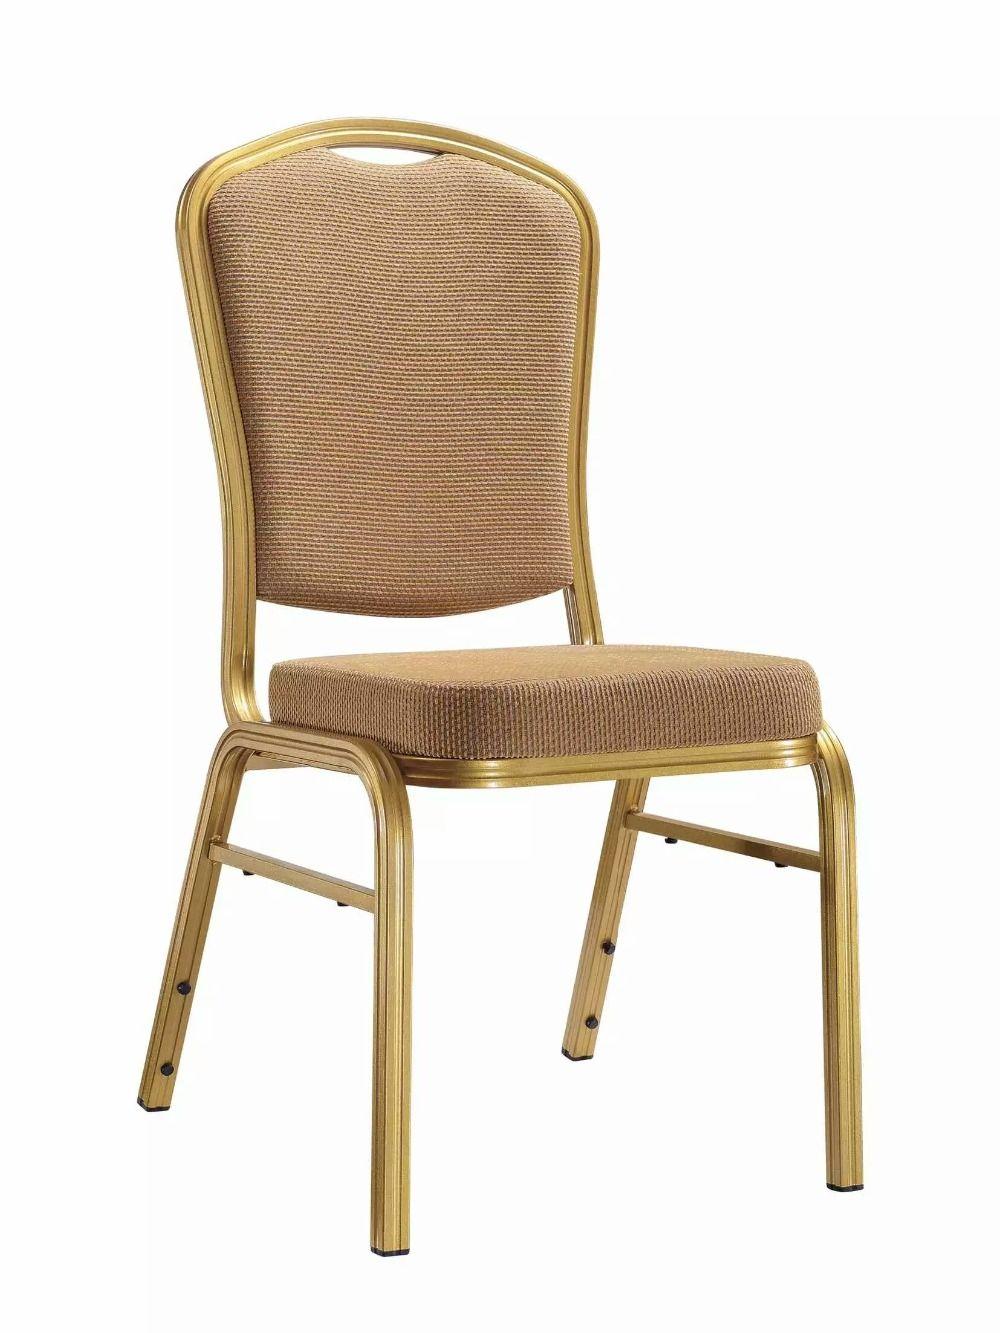 Restaurant chairs metal Banquet chair stackable chairs 5PC/ Carton